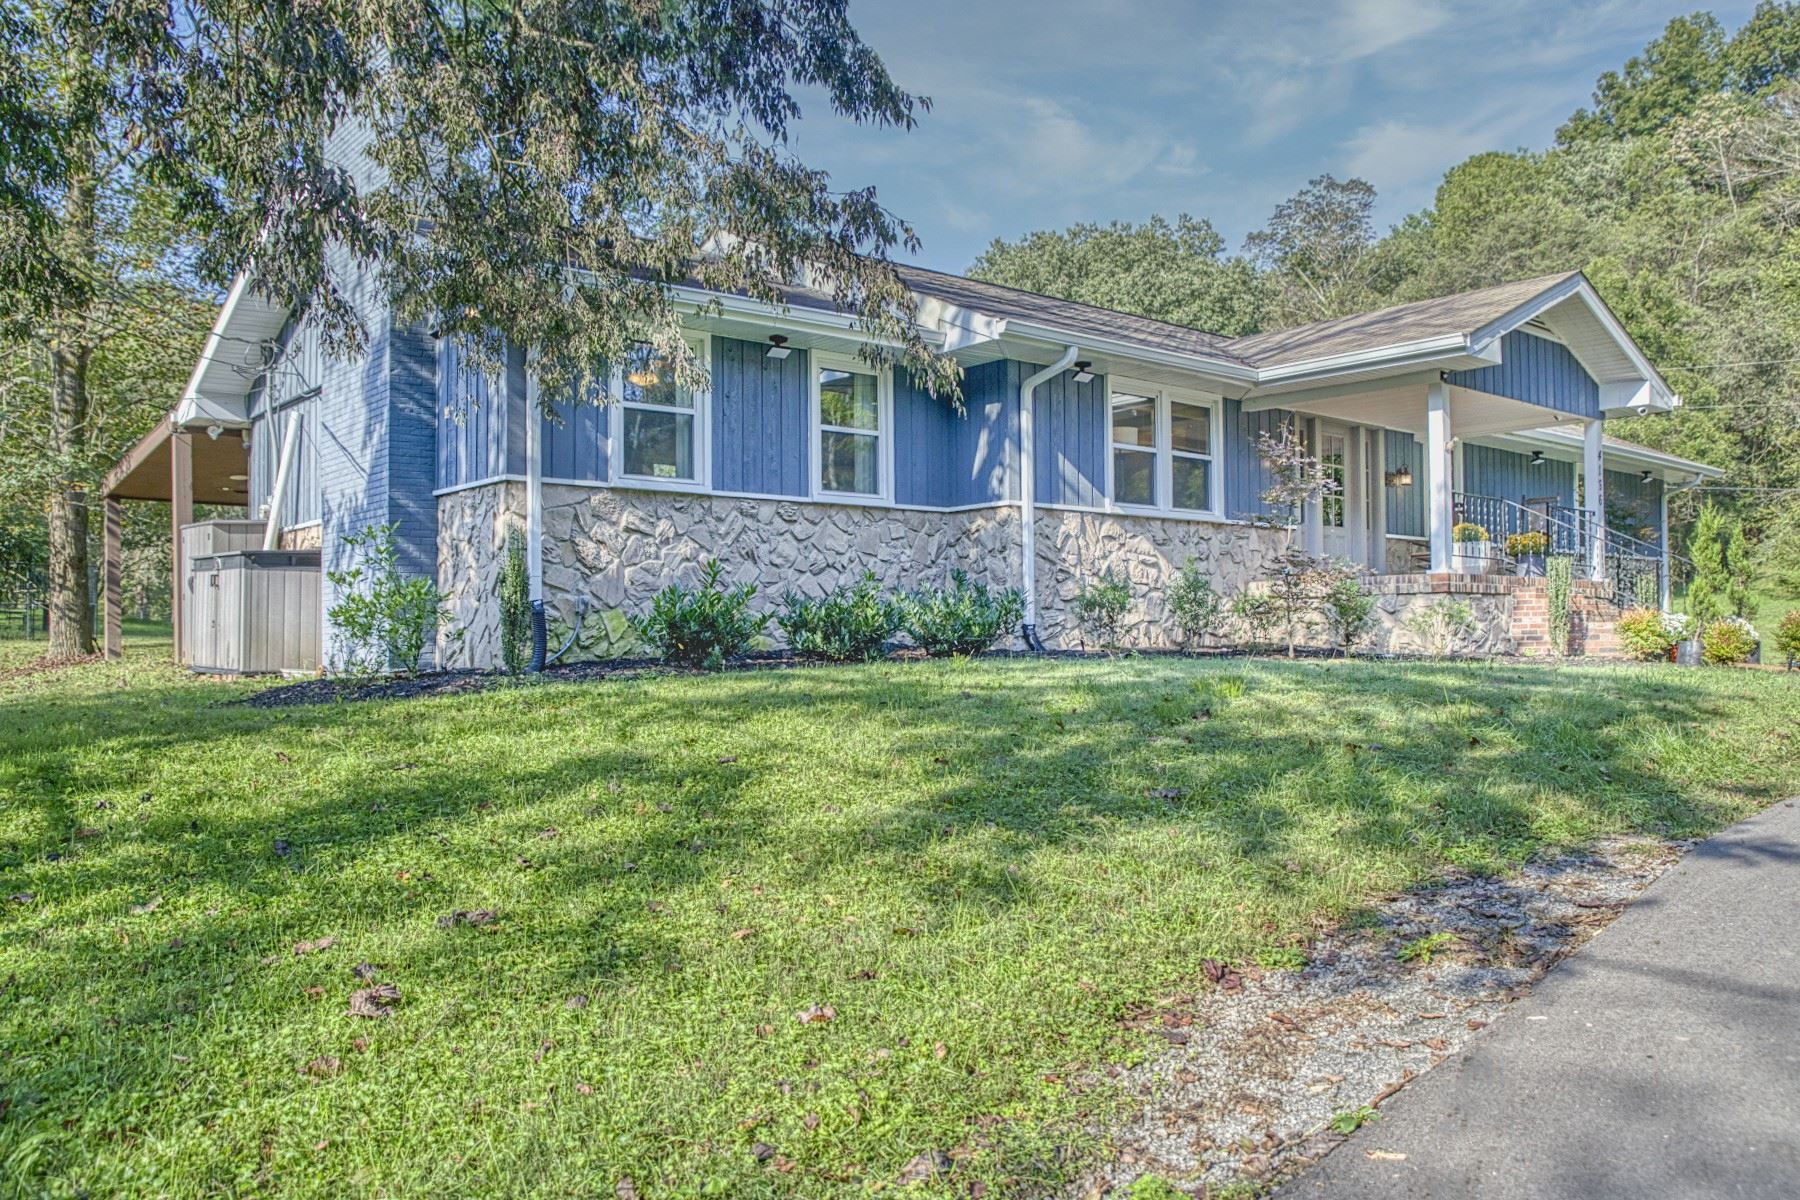 4166 Vester Rd, Whites Creek, TN 37189 - MLS#: 2298783